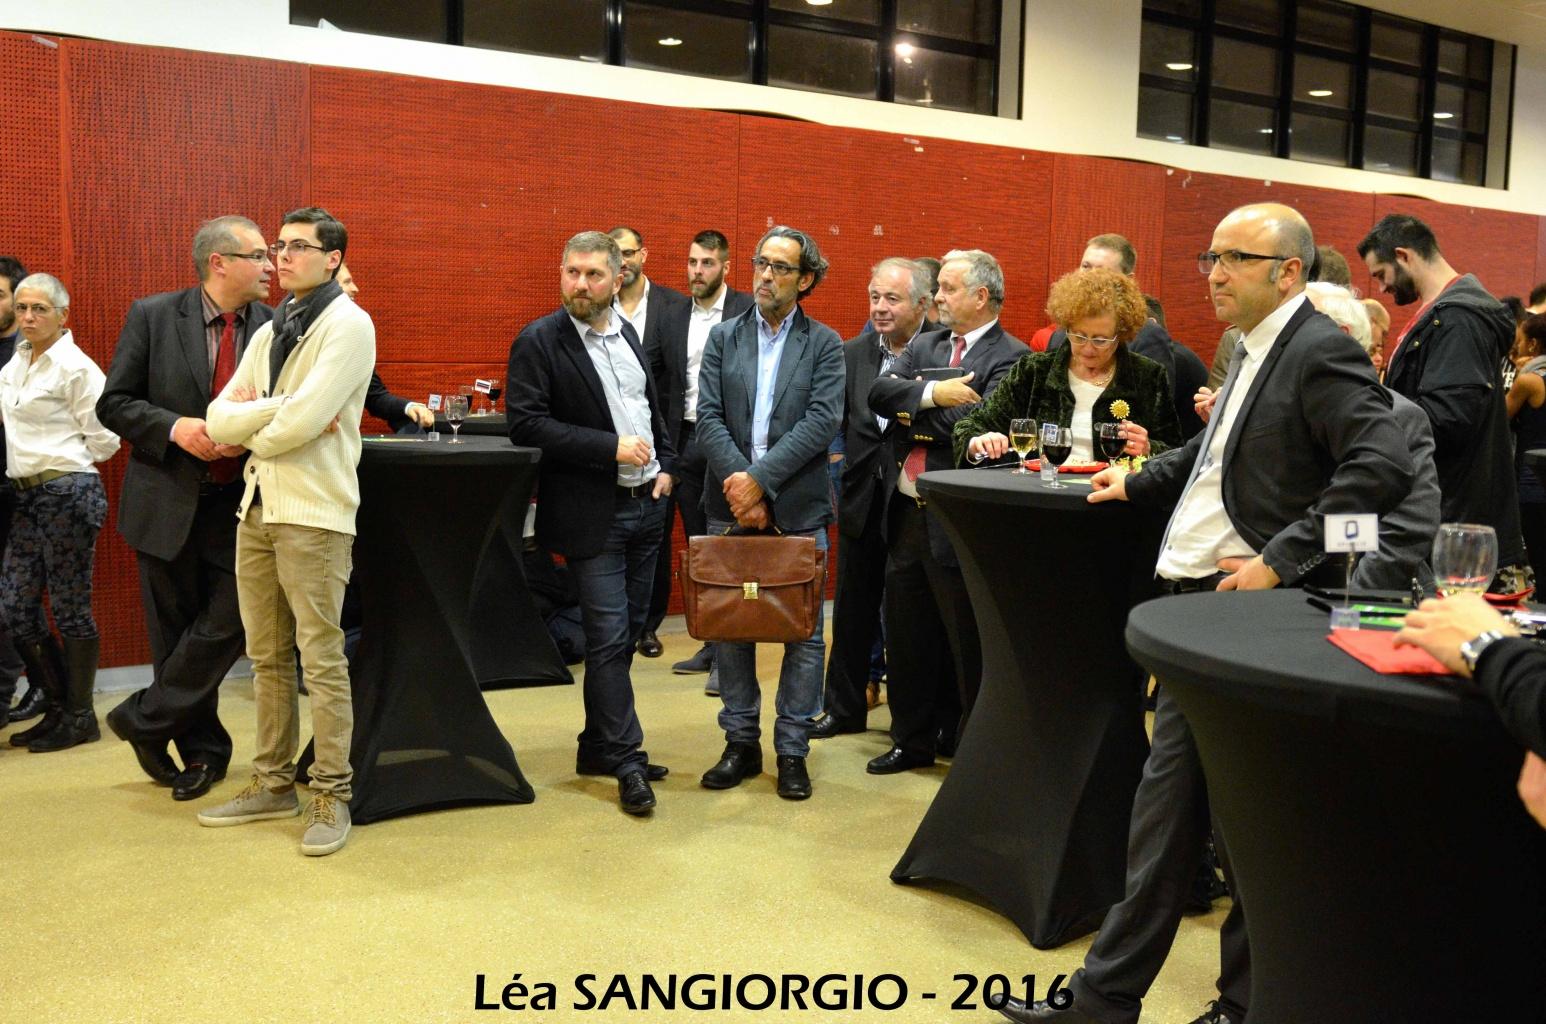 VIP US IVRY / AIX (Lea Sangiorgio)